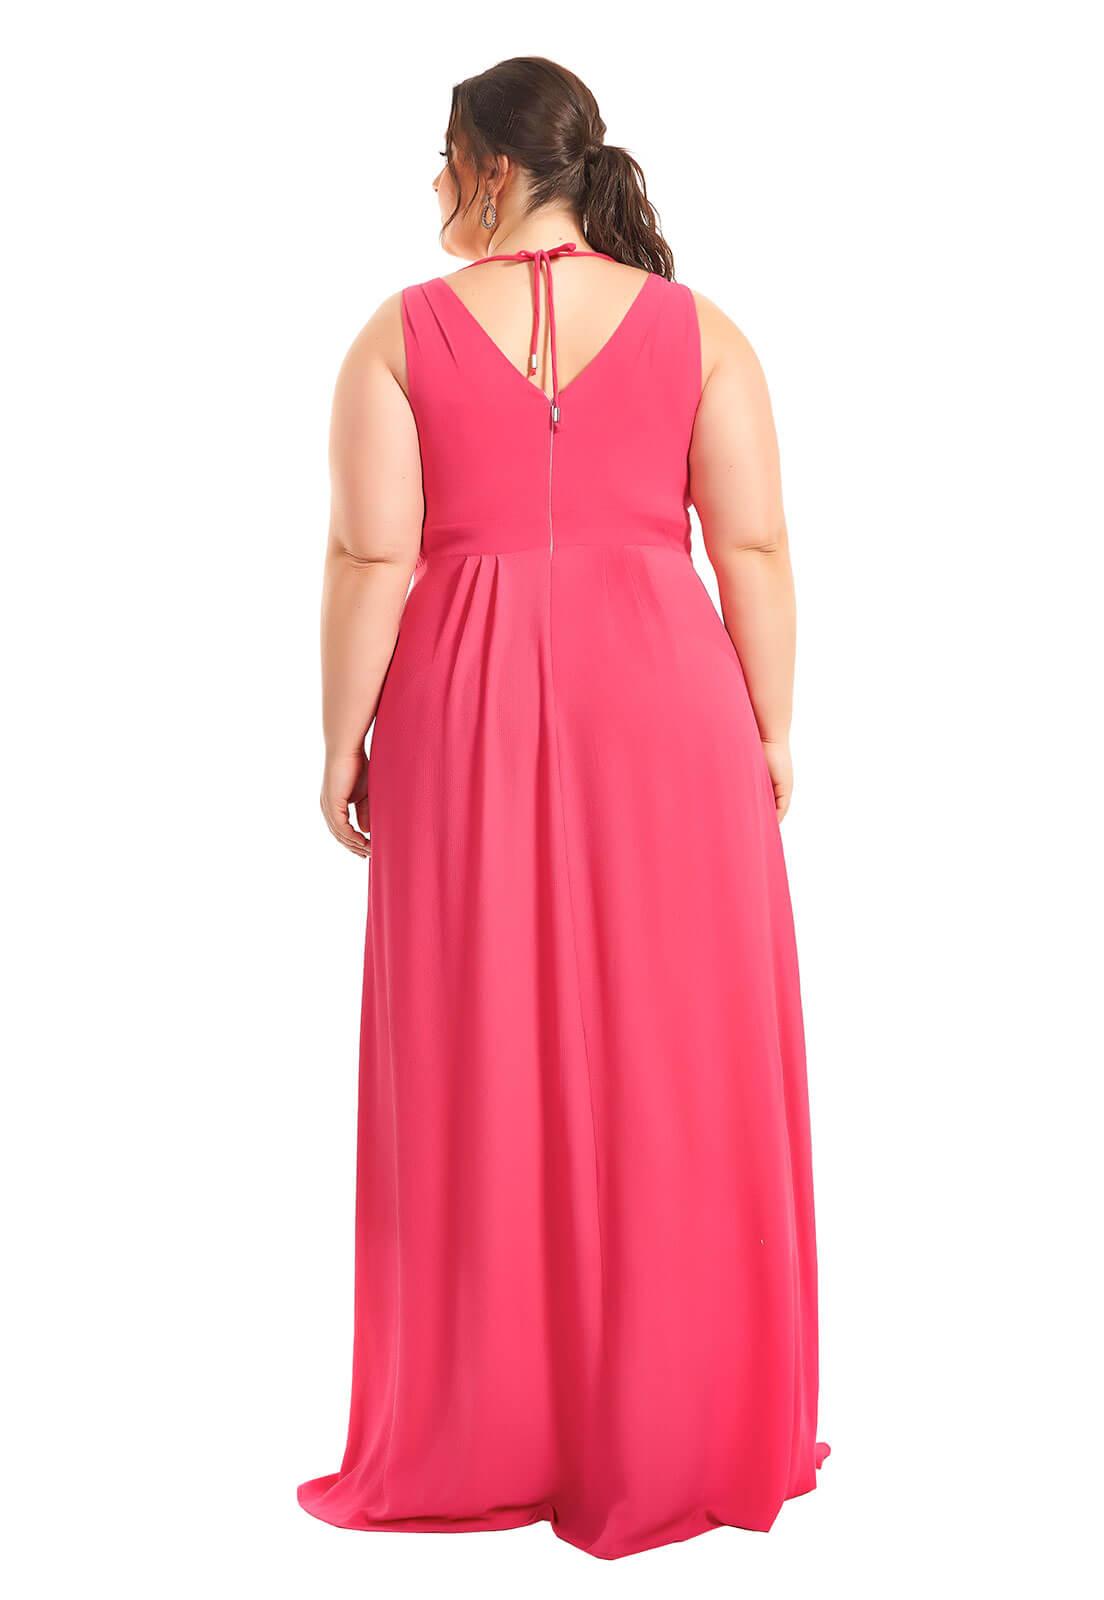 Vestido Plus Size Rosa Cupido